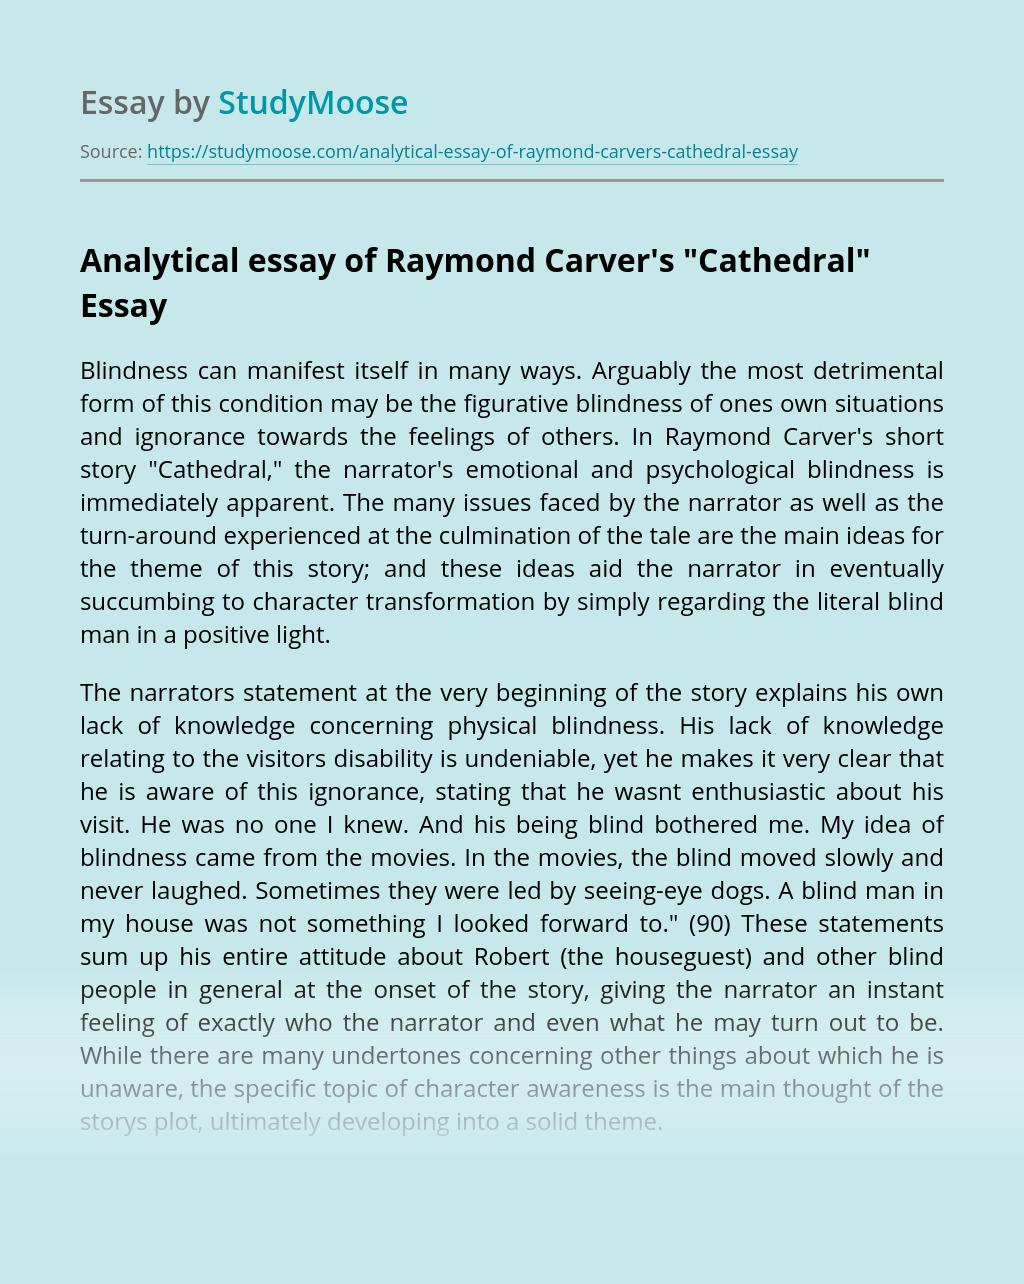 Analytical essay of Raymond Carver's